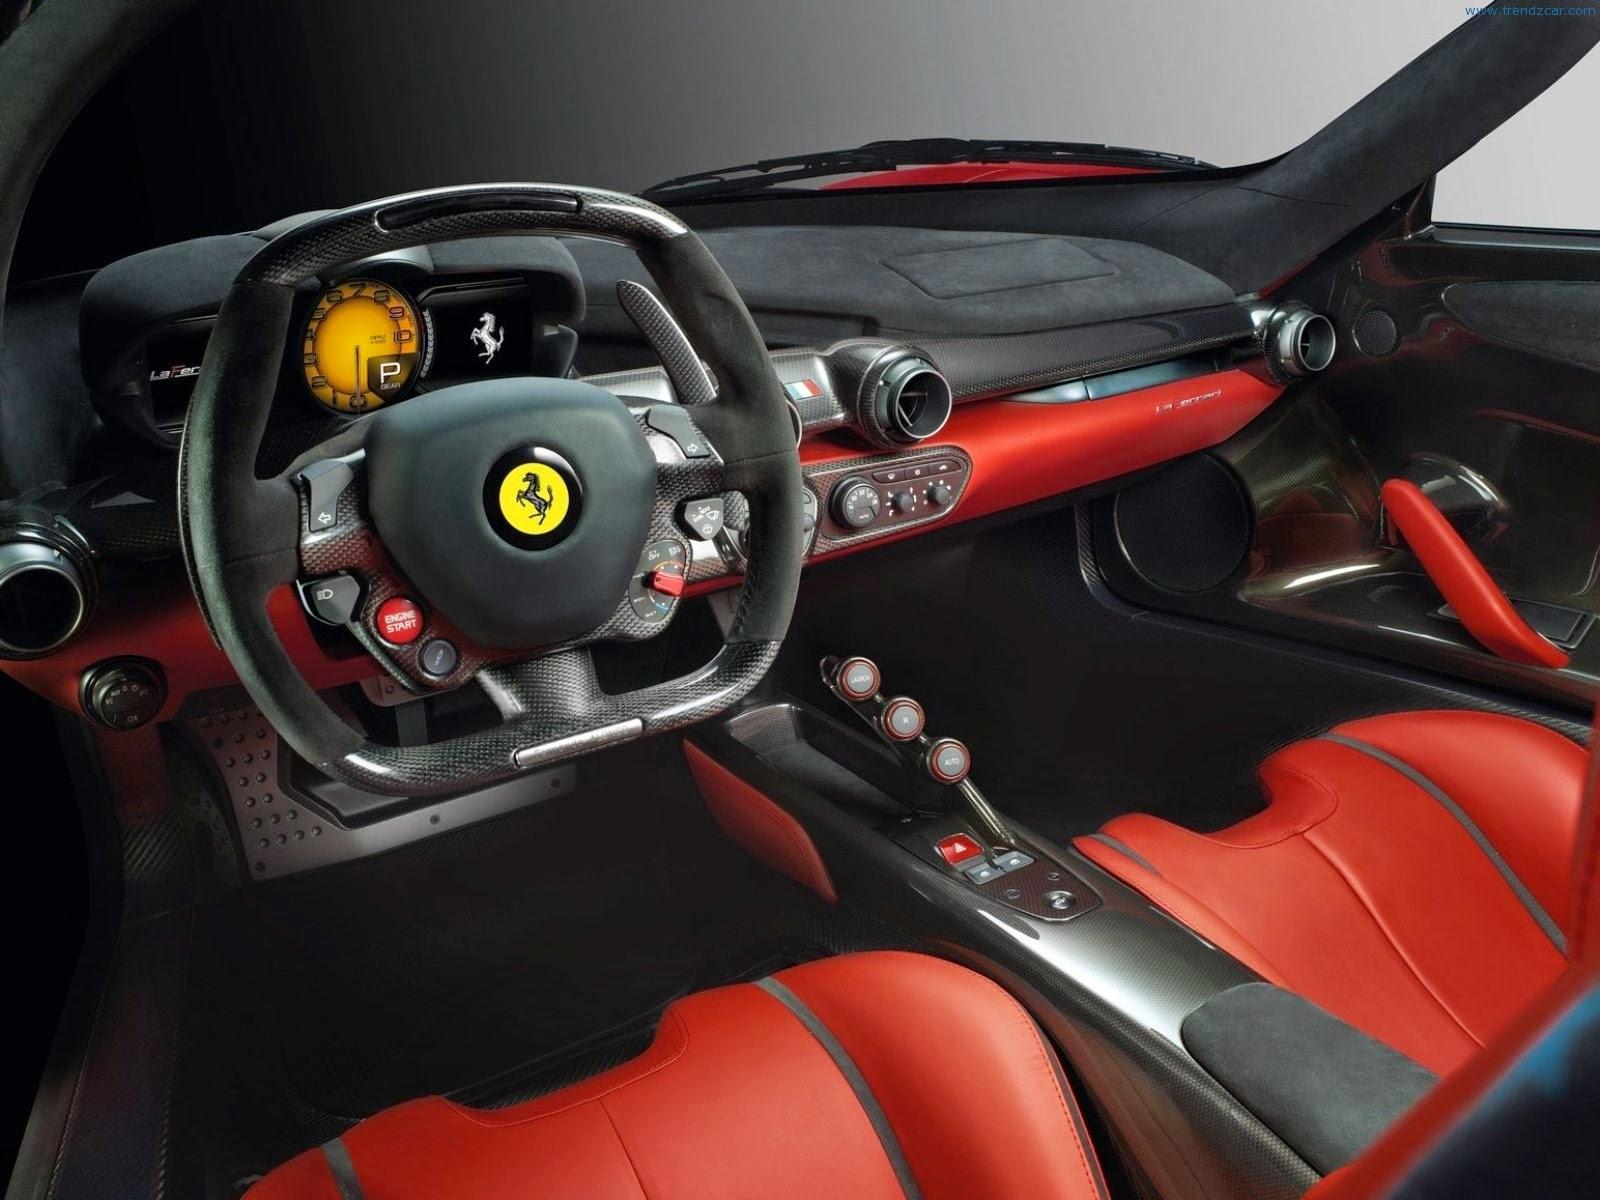 Ferrari 458 italia super car review full hd wallpapers my pinoo ferrari 458 italia super car review full hd wallpapers vanachro Gallery